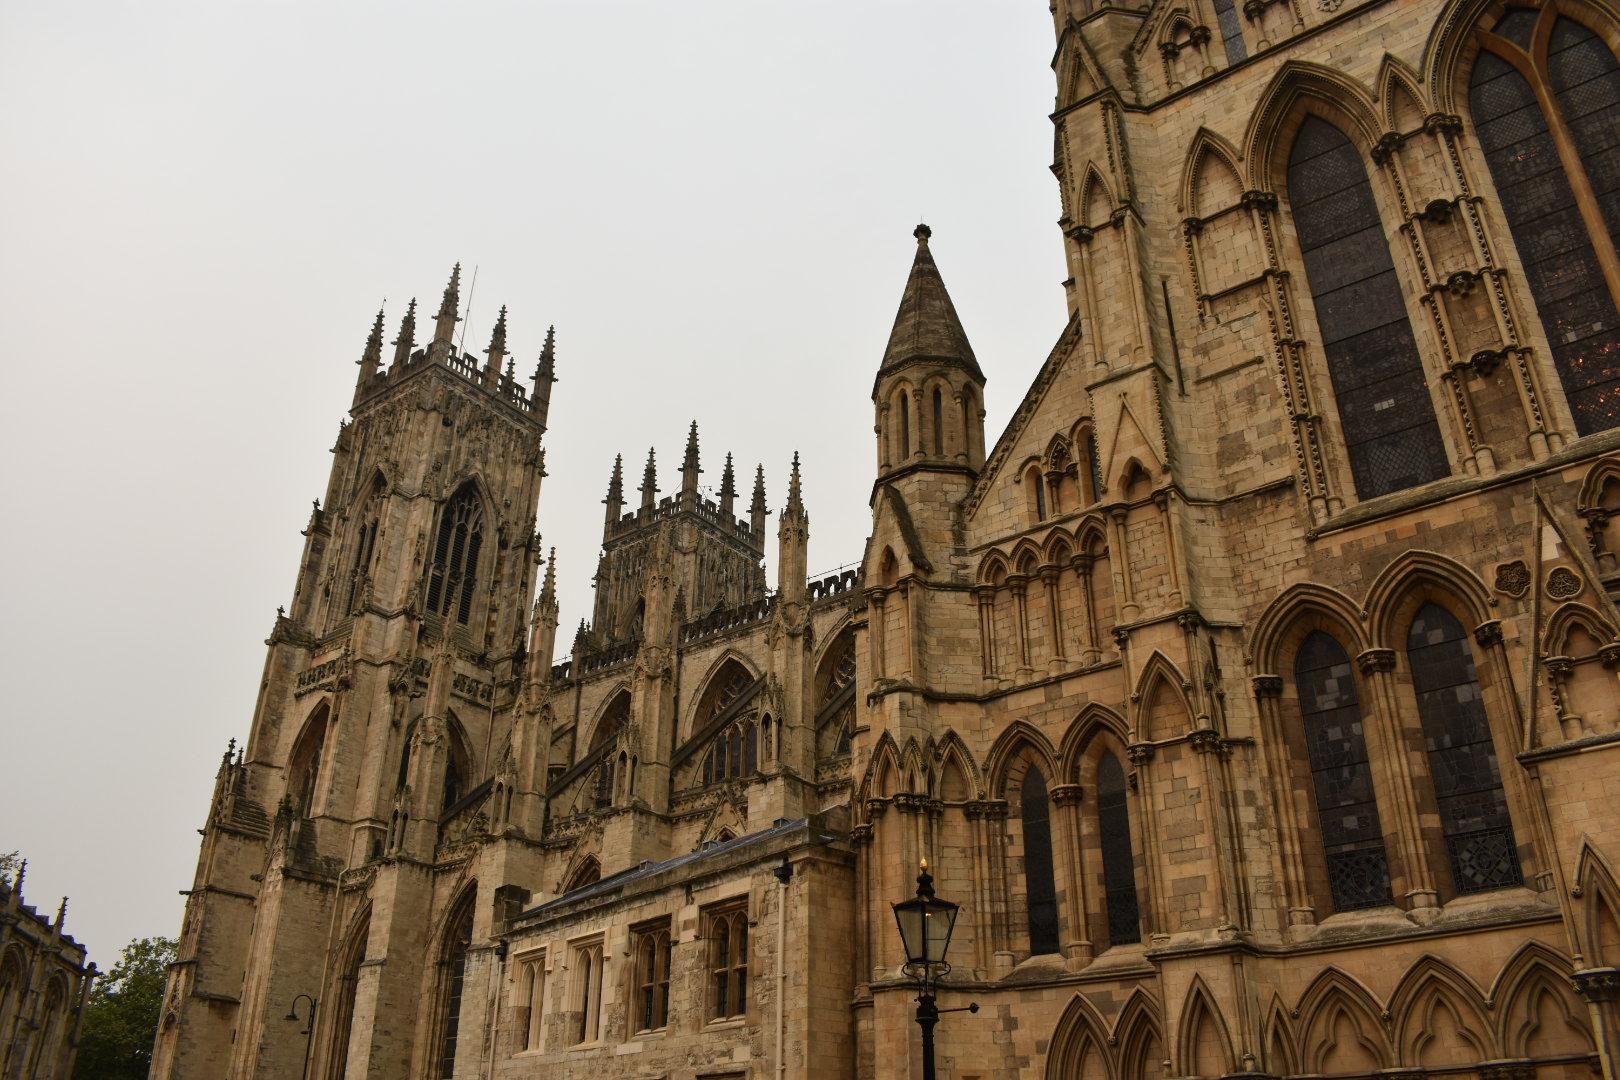 York Minster, York, England